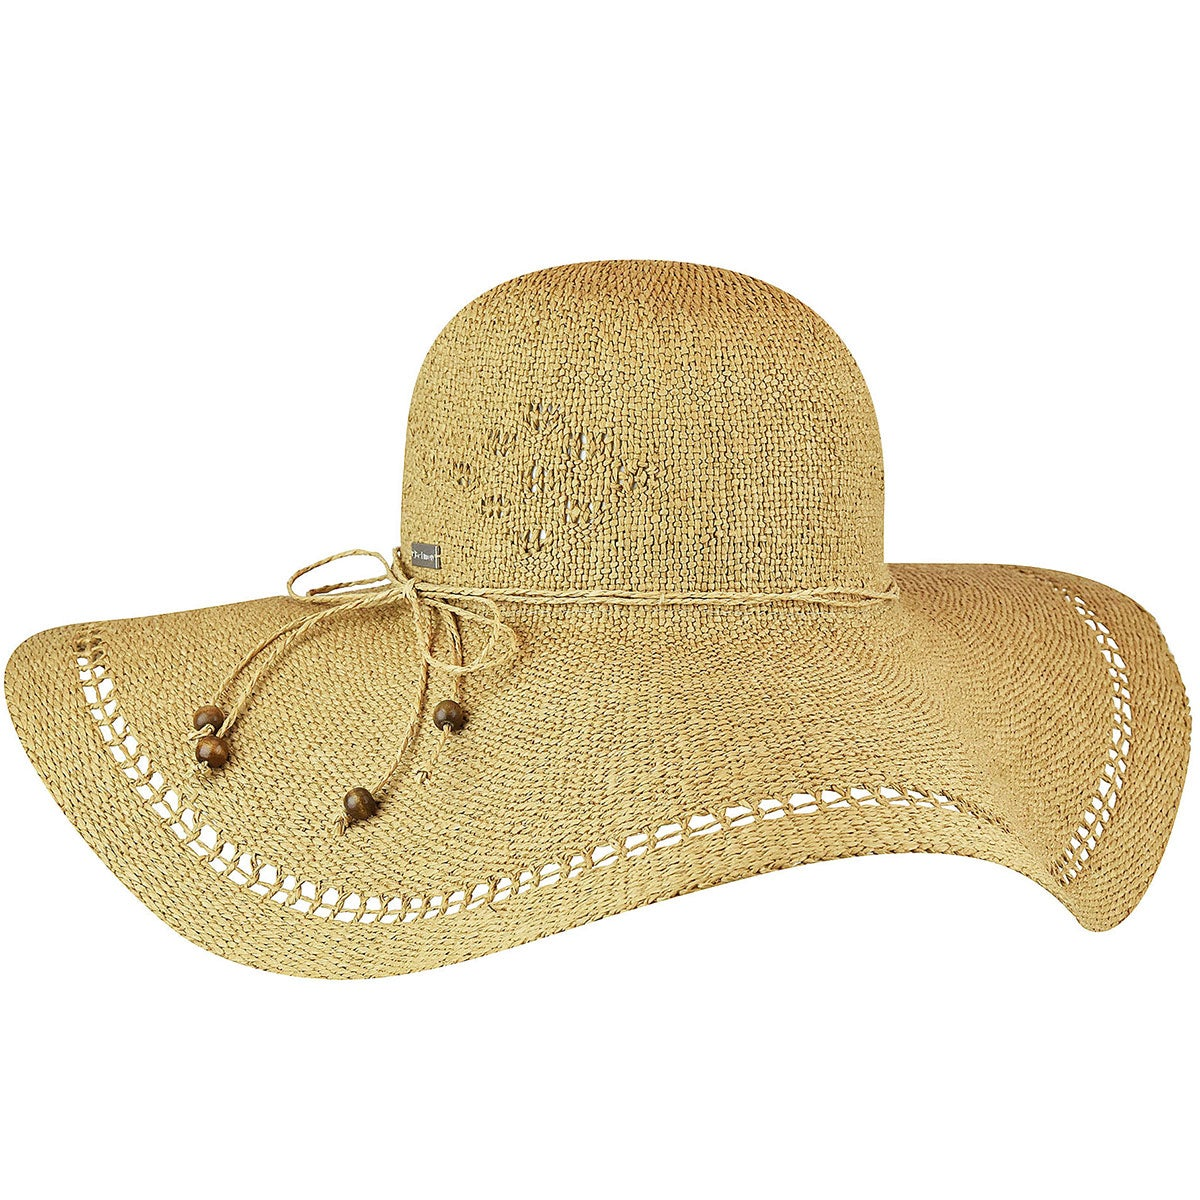 Betmar Abbey Wide Brim Hat in Honey